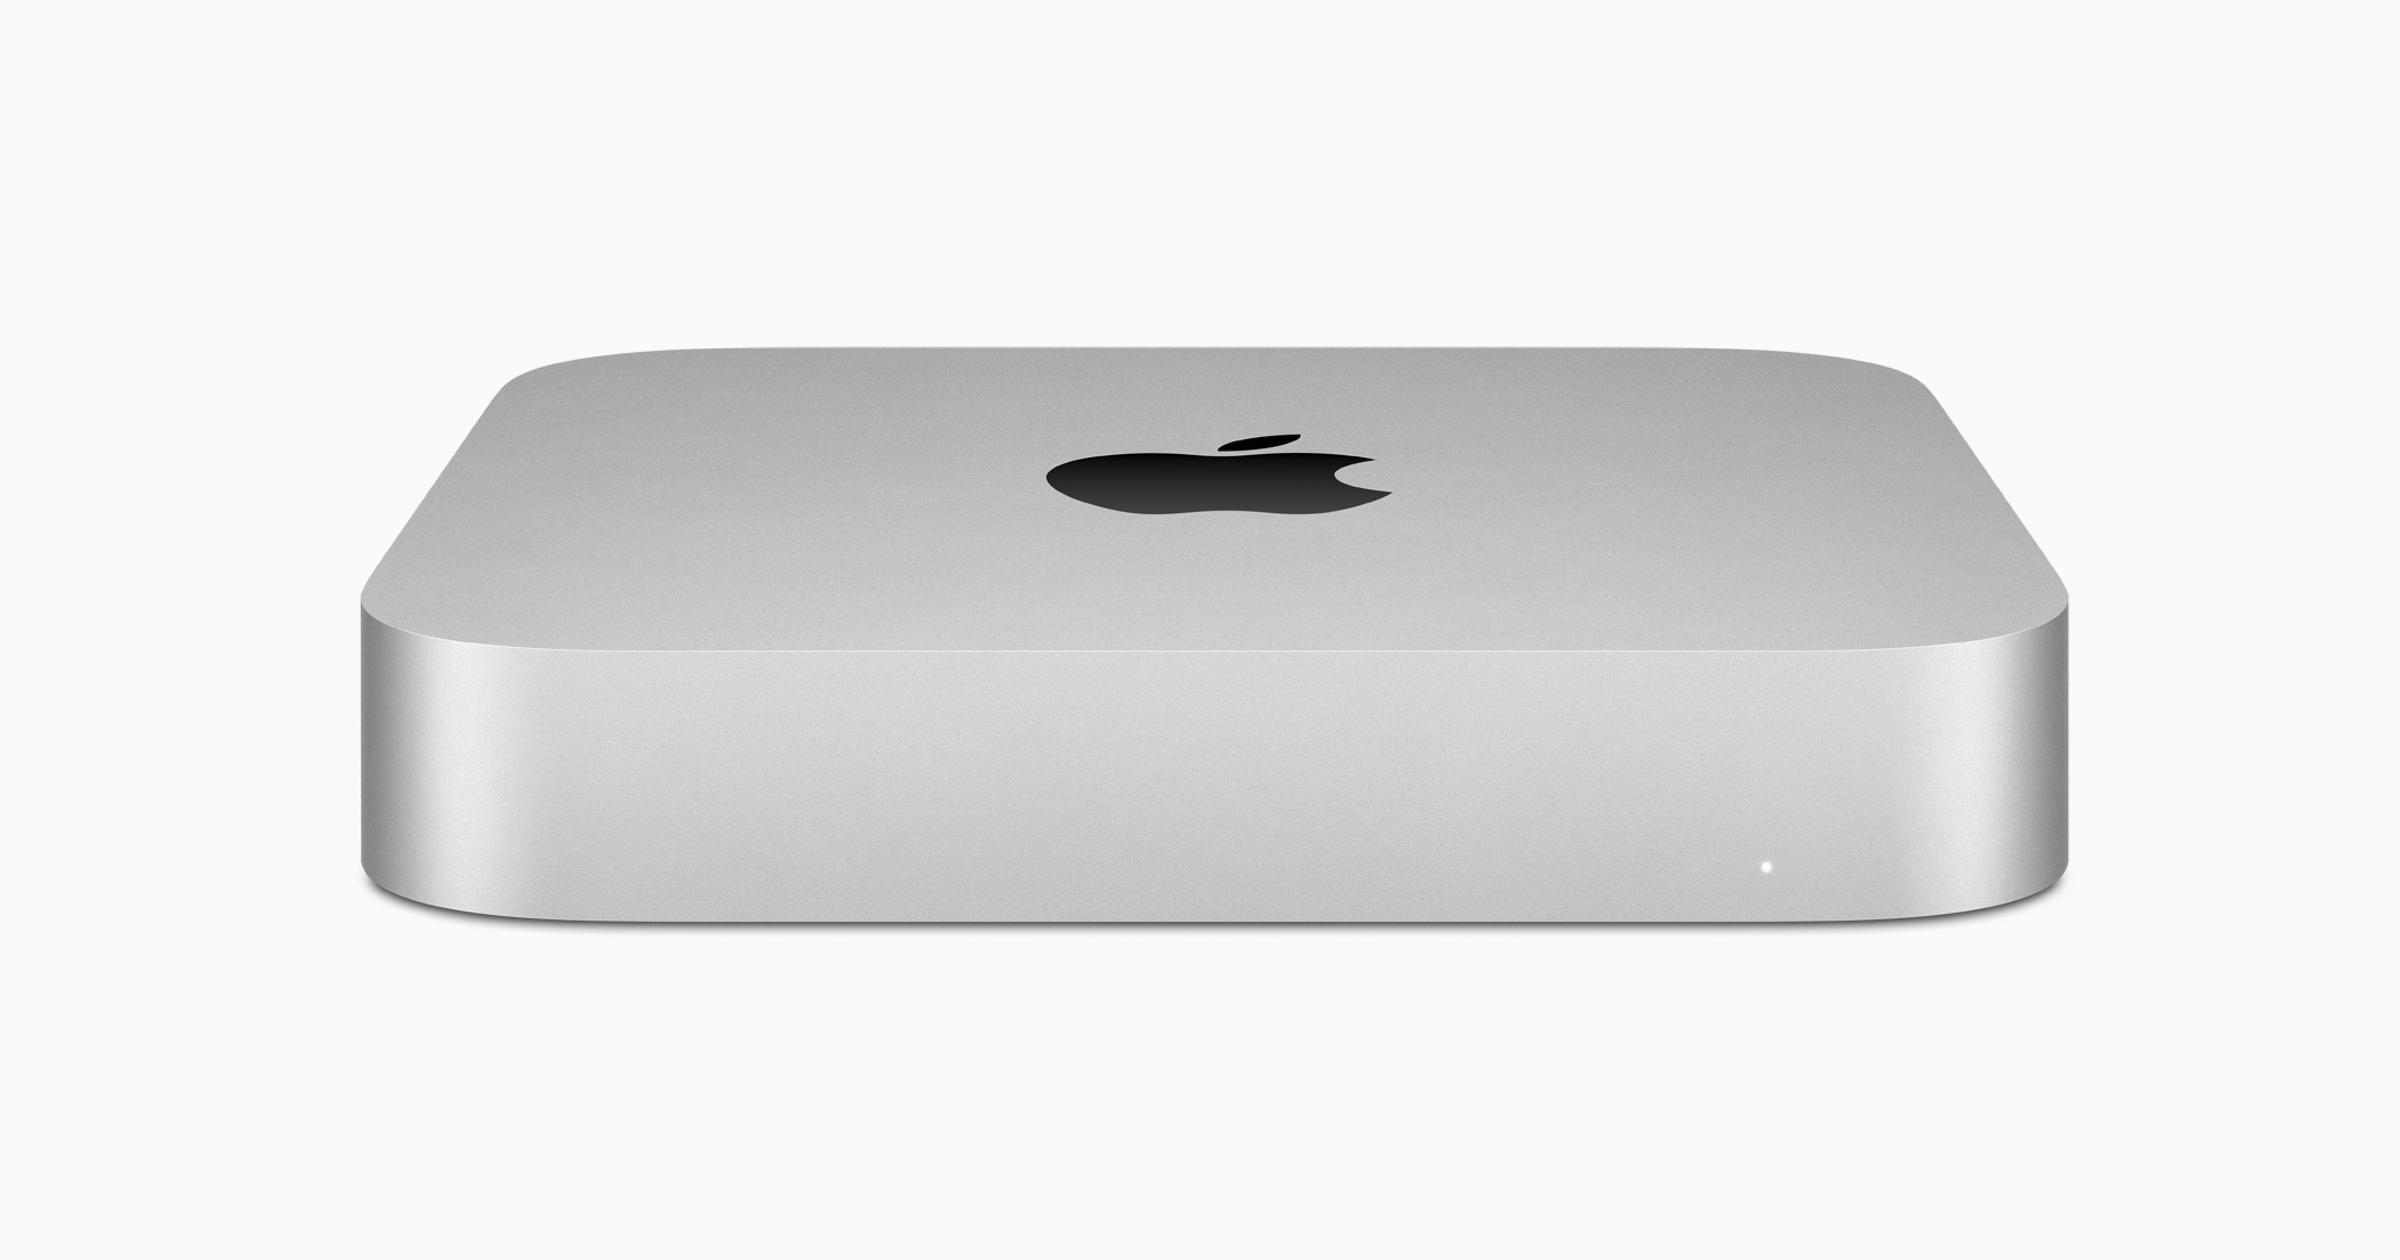 New Mac mini with M1 chip